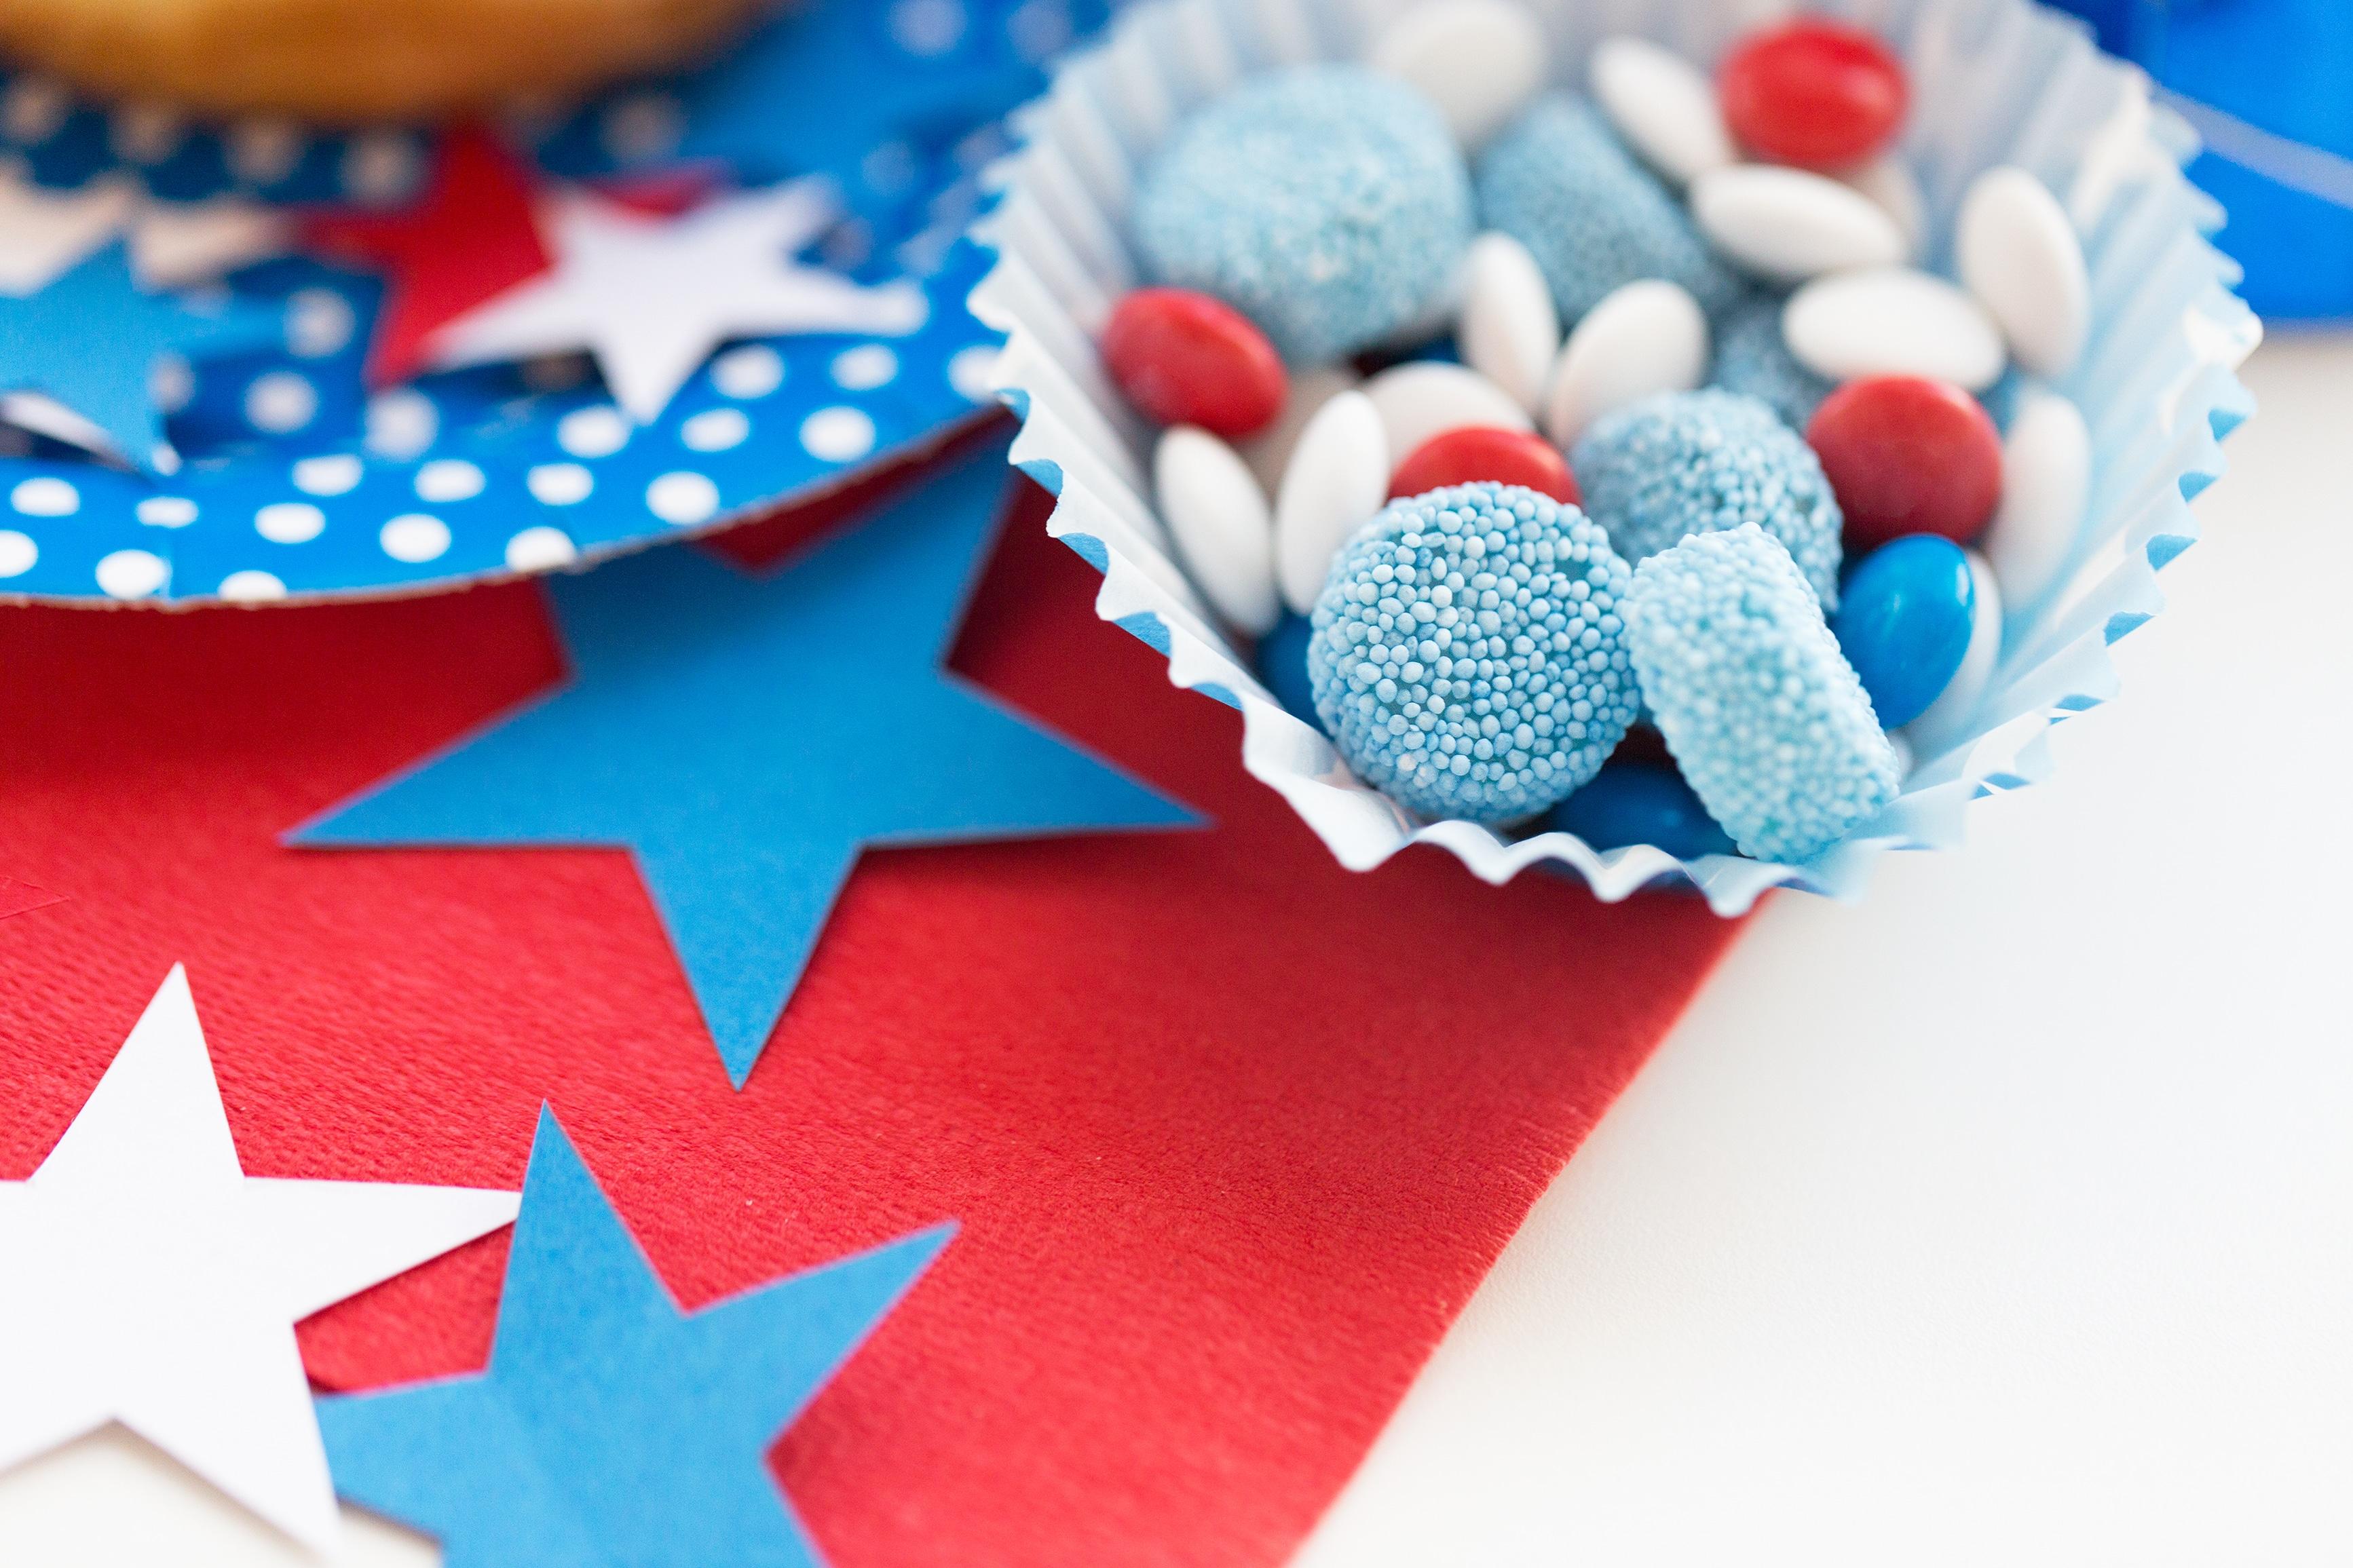 confetti and candies